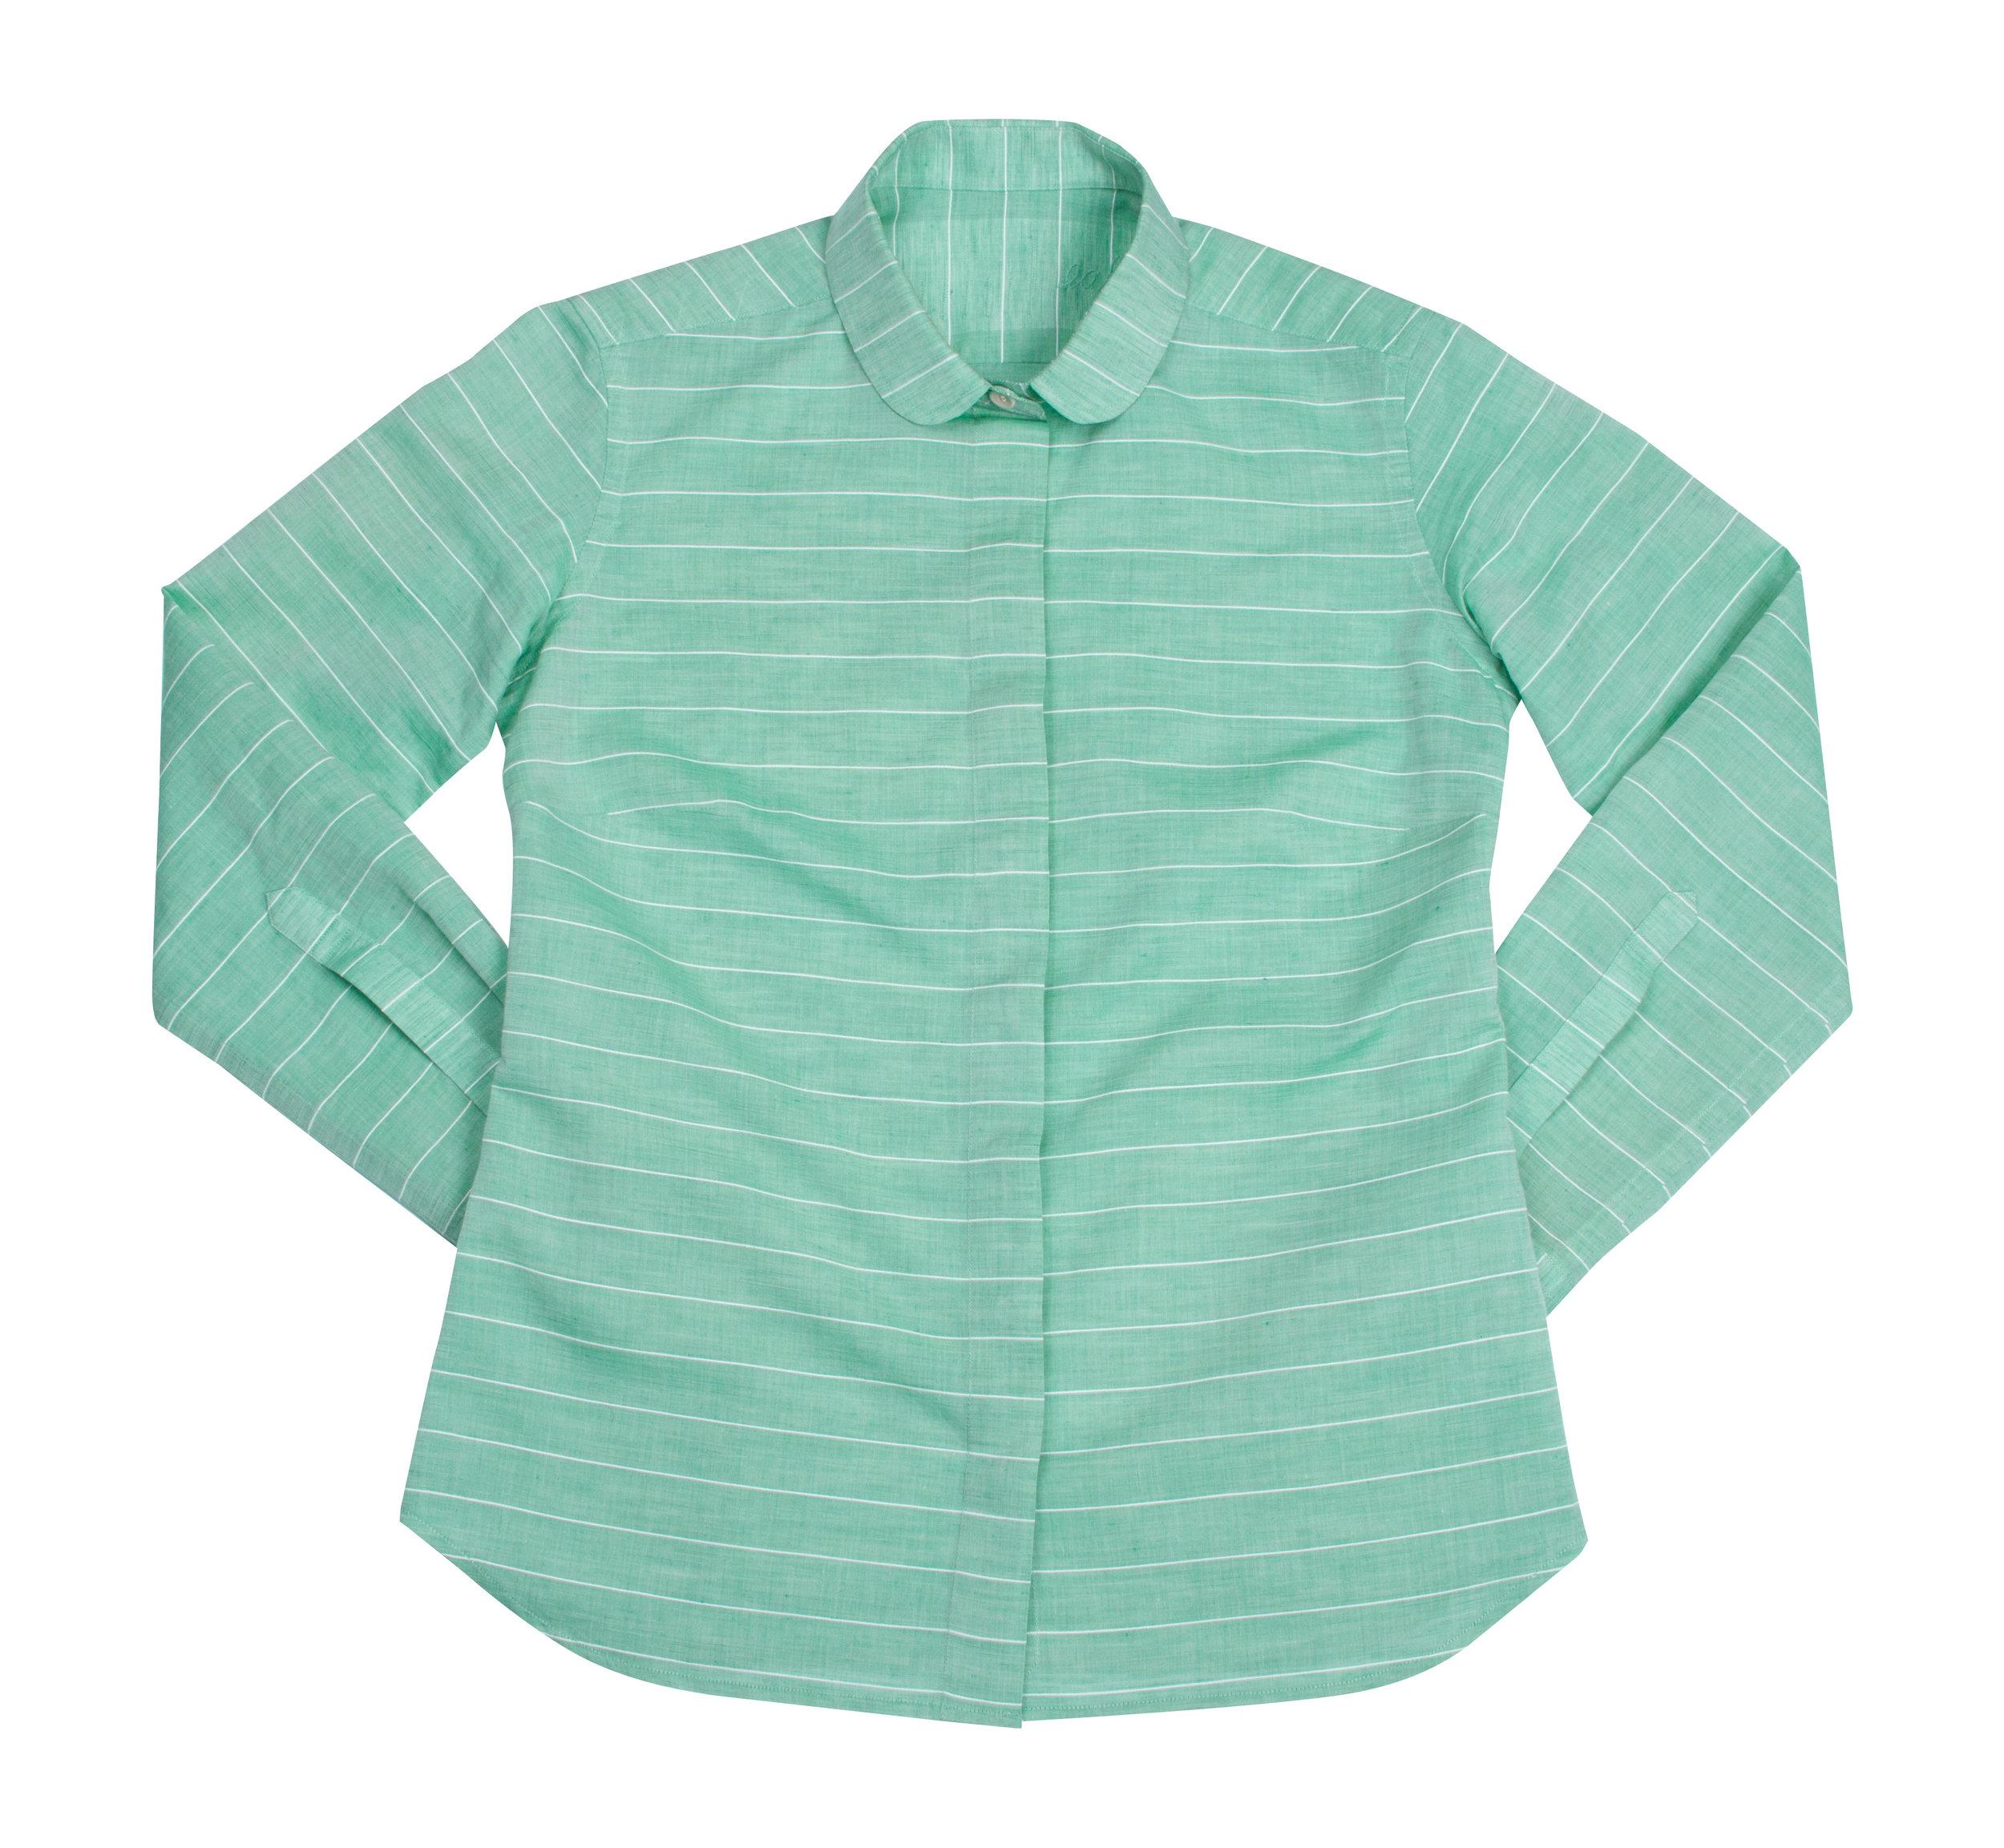 Midori shirt   R2450